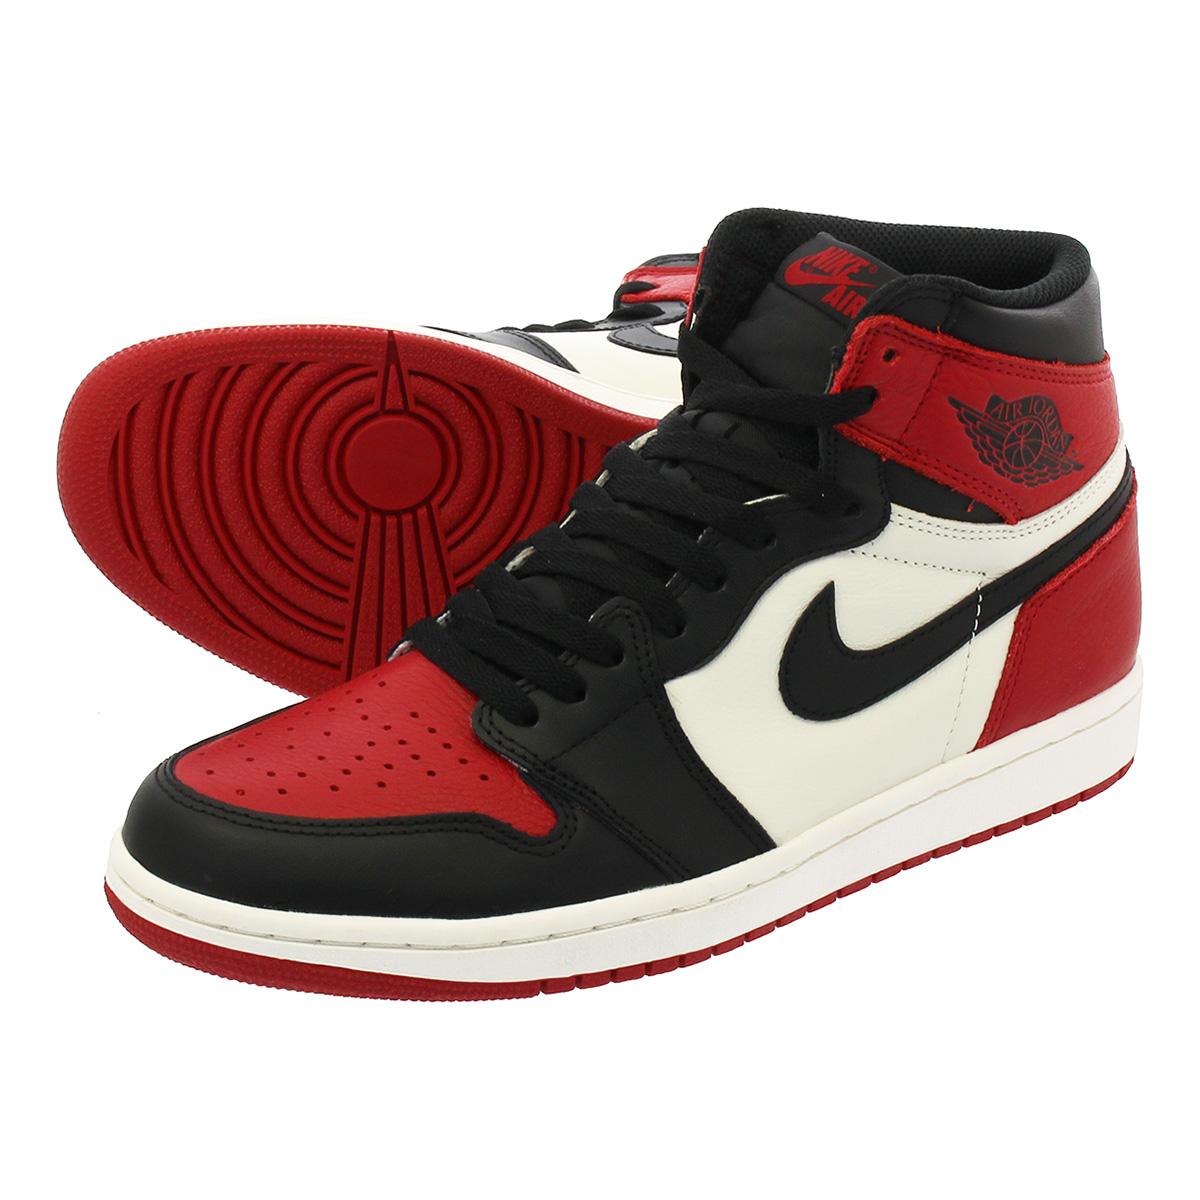 NIKE AIR JORDAN 1 RETRO HIGH OG Nike Air Jordan 1 nostalgic high OG GYM RED  BLACK SUMMIT WHITE a3cc4186e